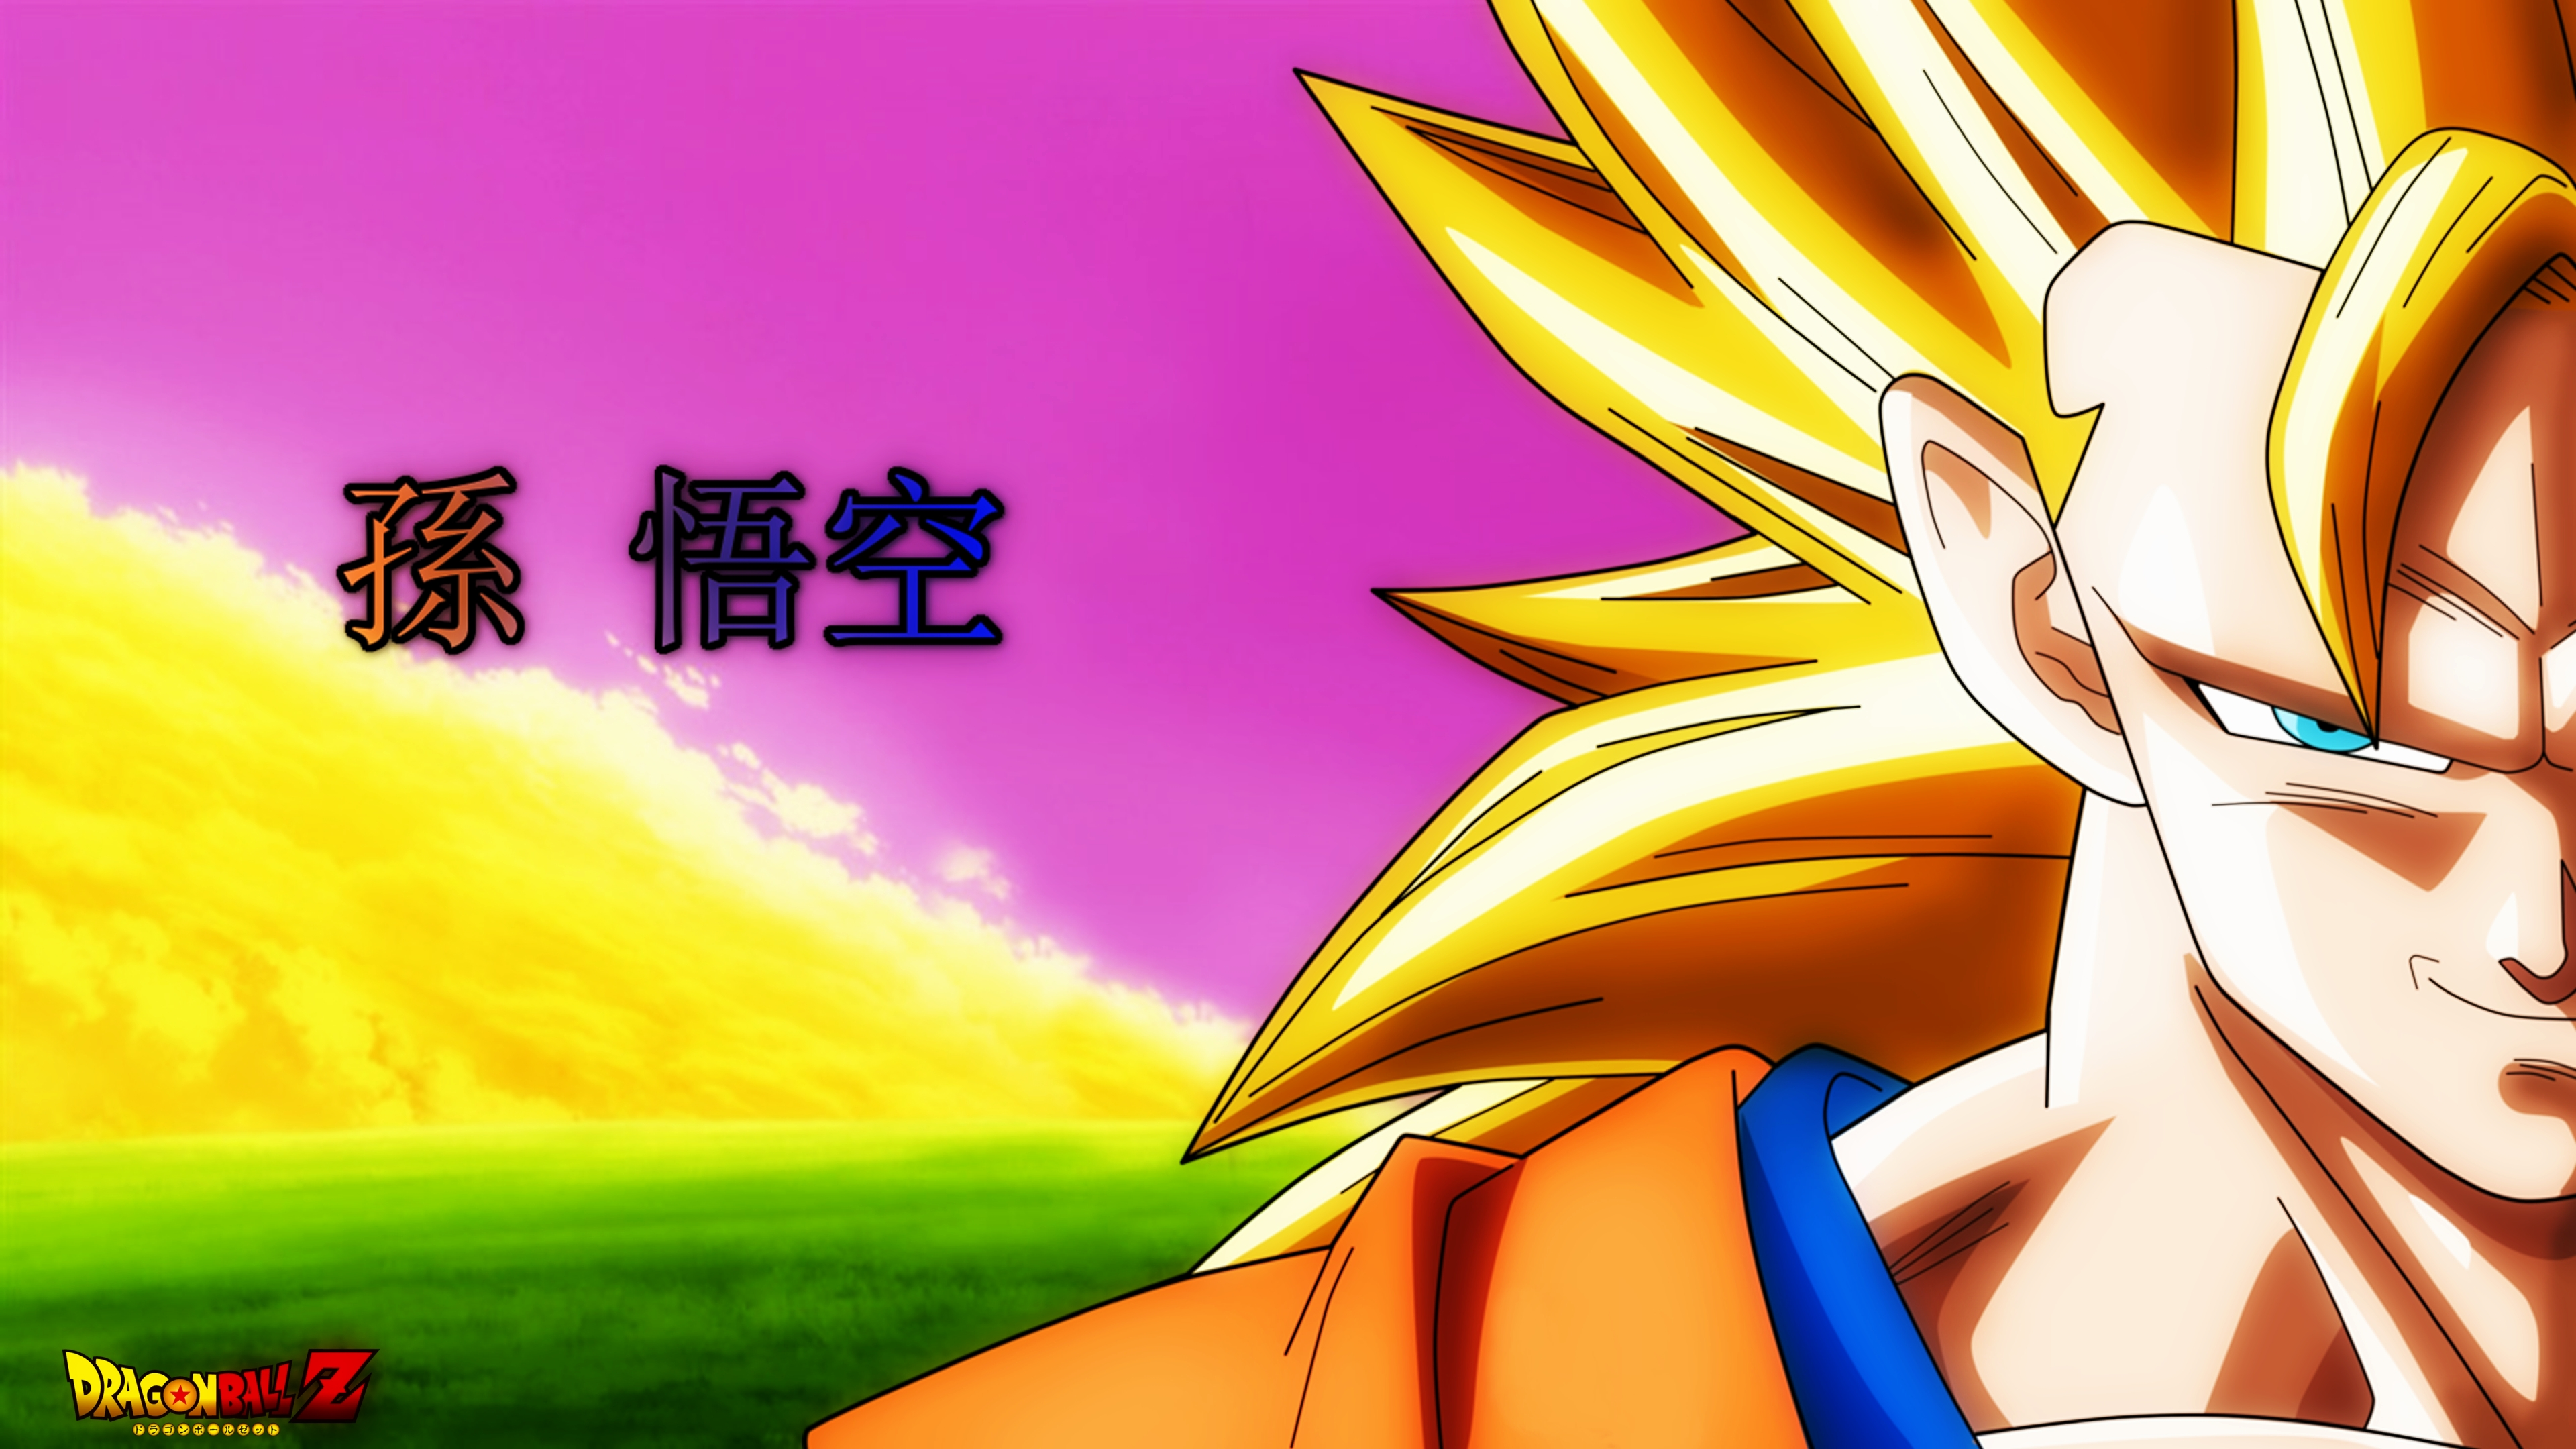 Dragonball z goku super saiyan 3 wallpaper 4k by - Goku wallpaper 4k ...